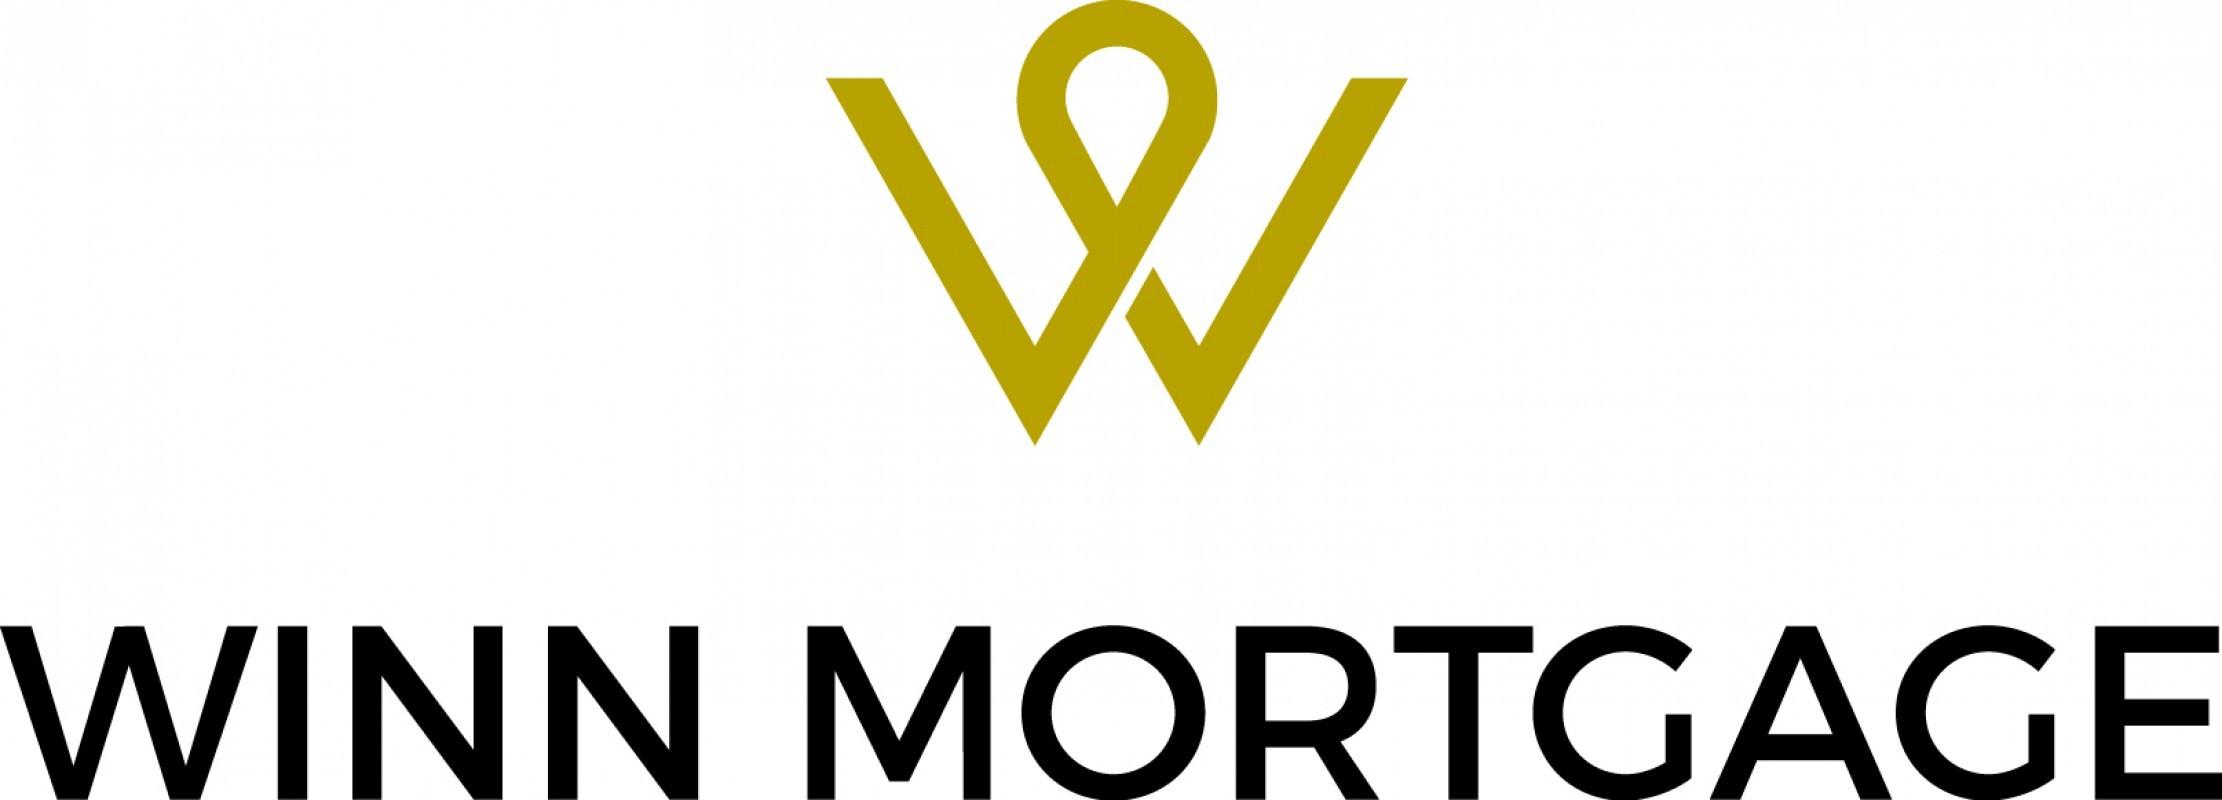 Winn Mortgage Inc